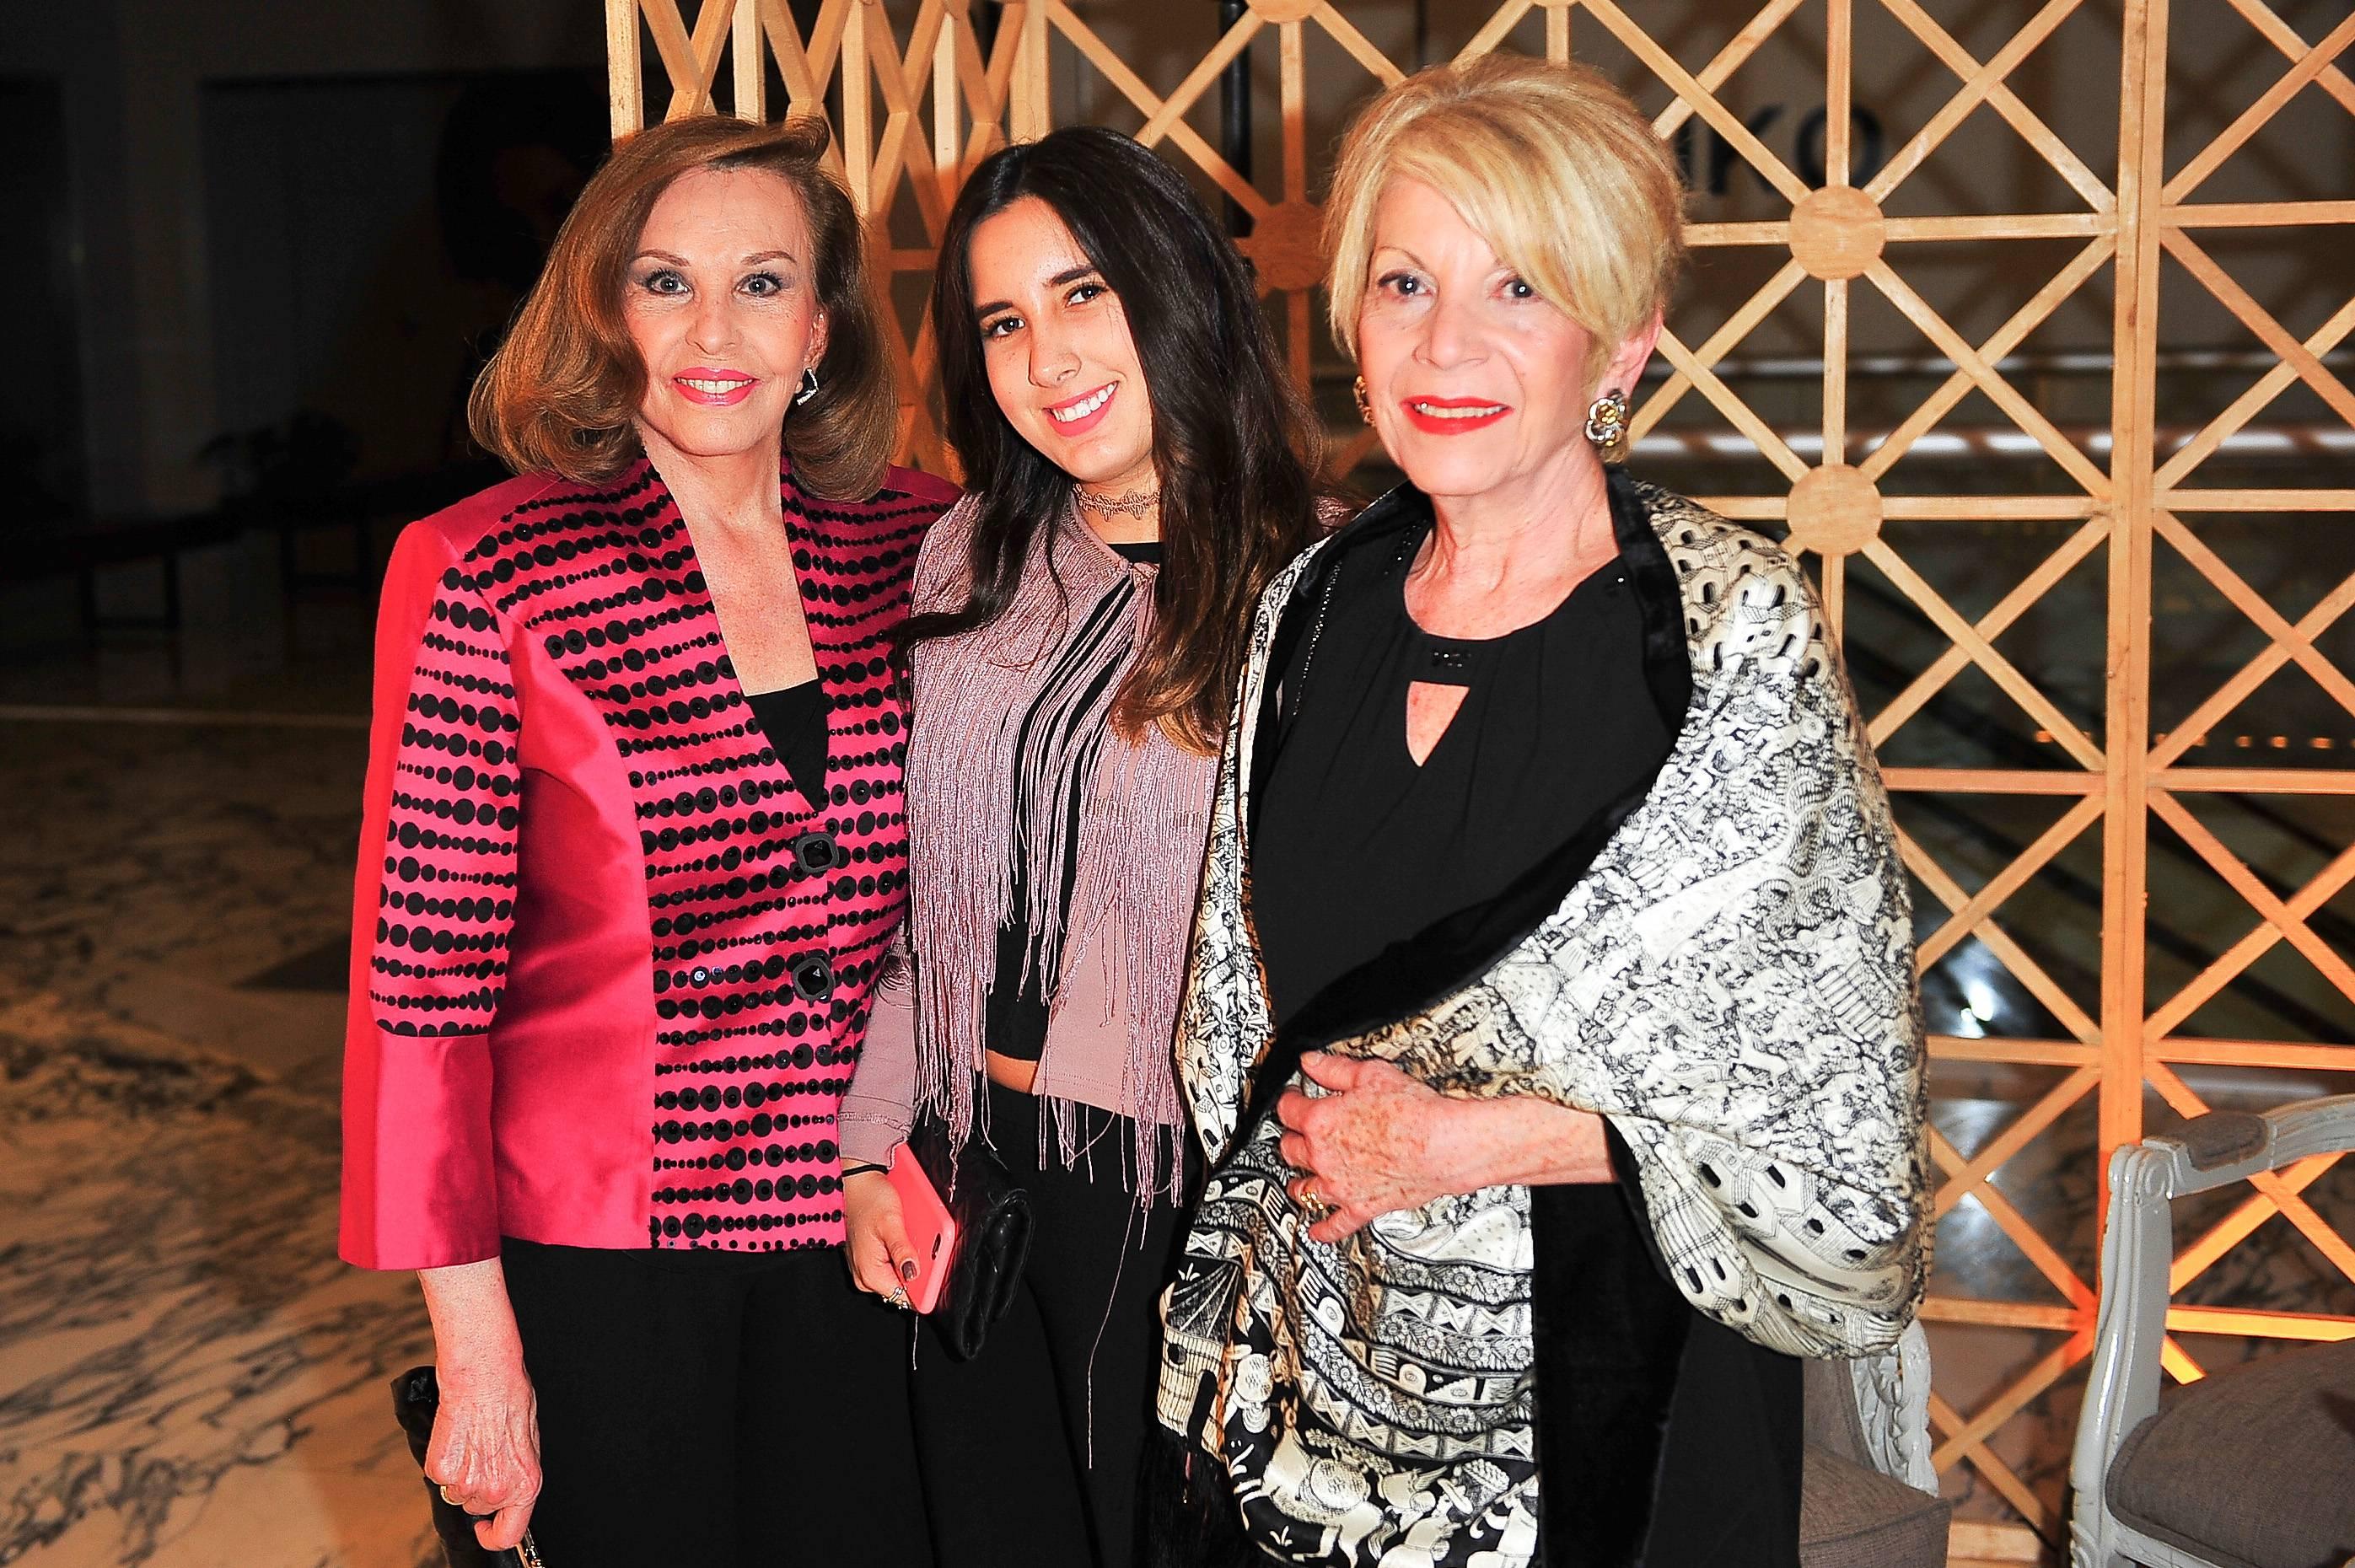 Kena Moreno, Marisol Mora y Odett de Anda JDS